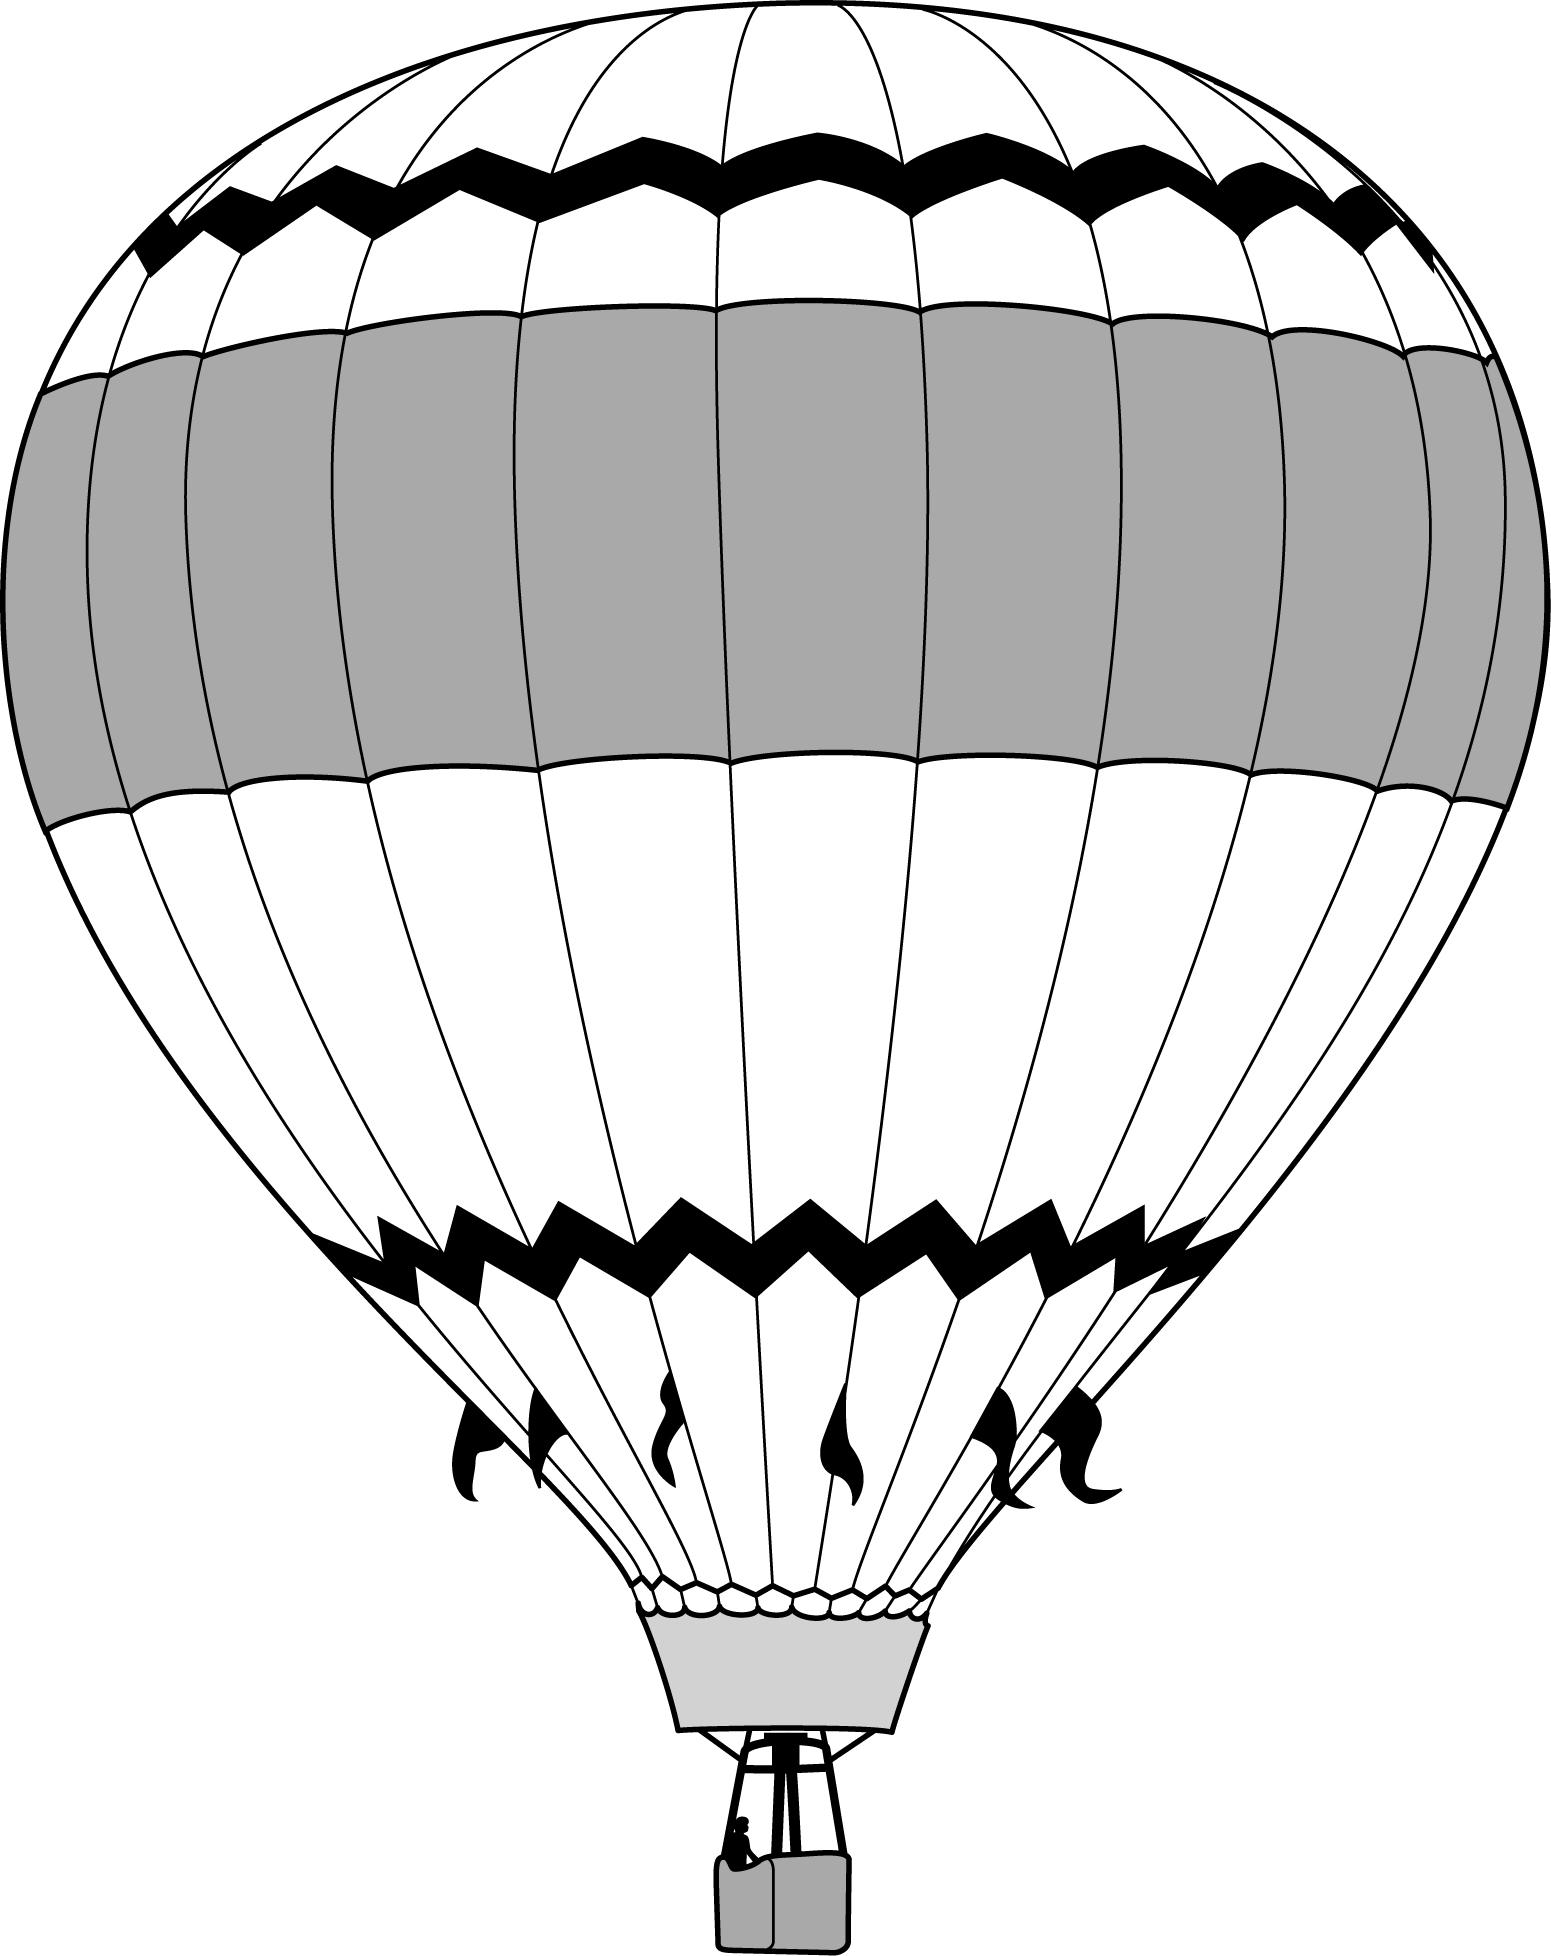 Hot Air Balloon Design Wood Carving | Walnut Hollow - Craft